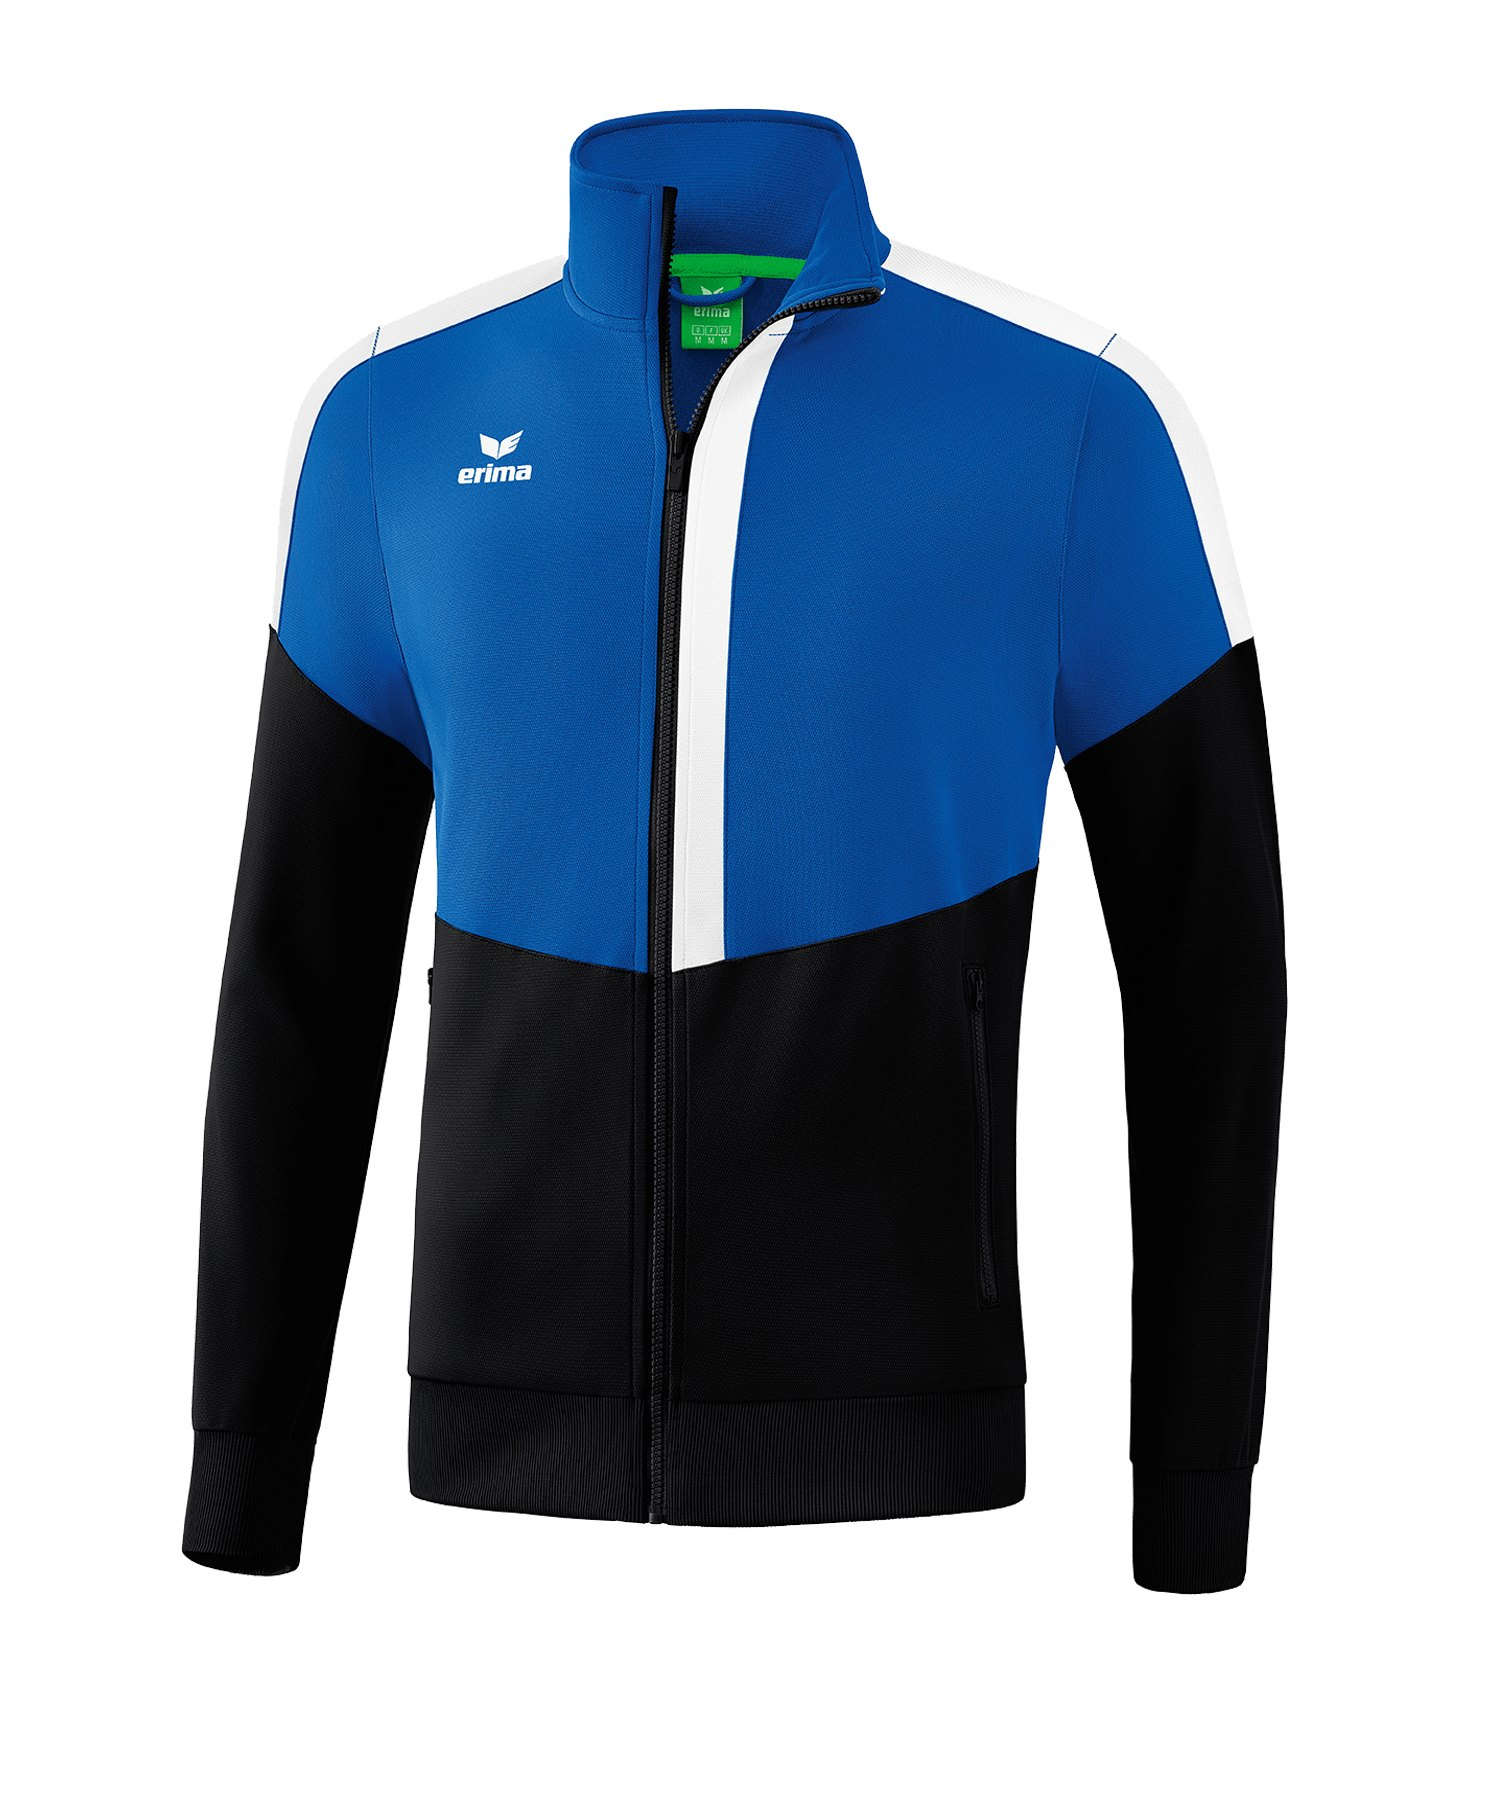 Erima Squad Trainingsjacke Blau Schwarz - blau